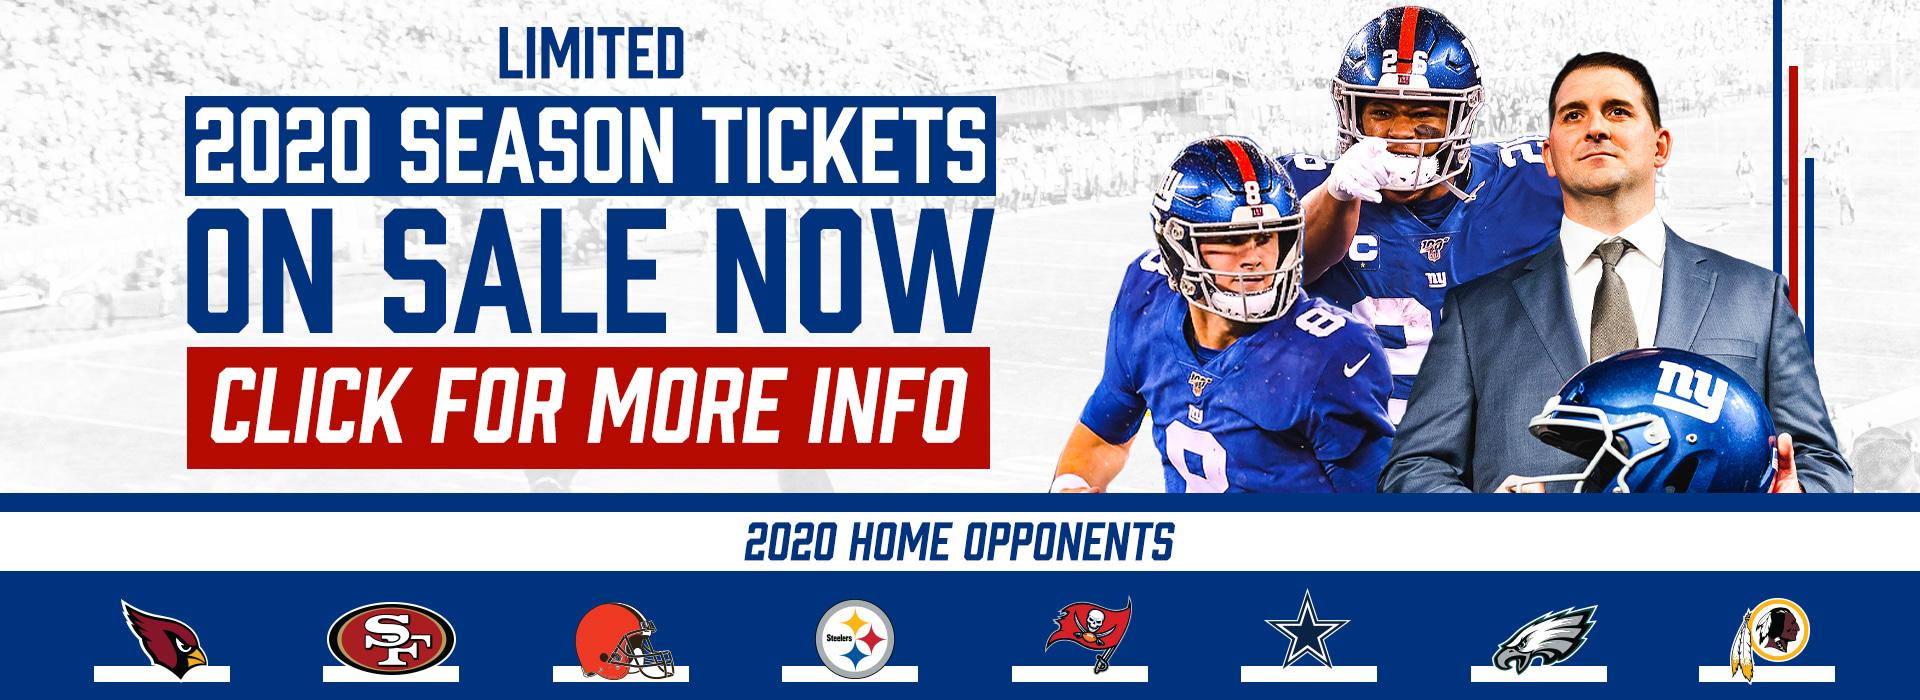 Giants Season Ticket Information